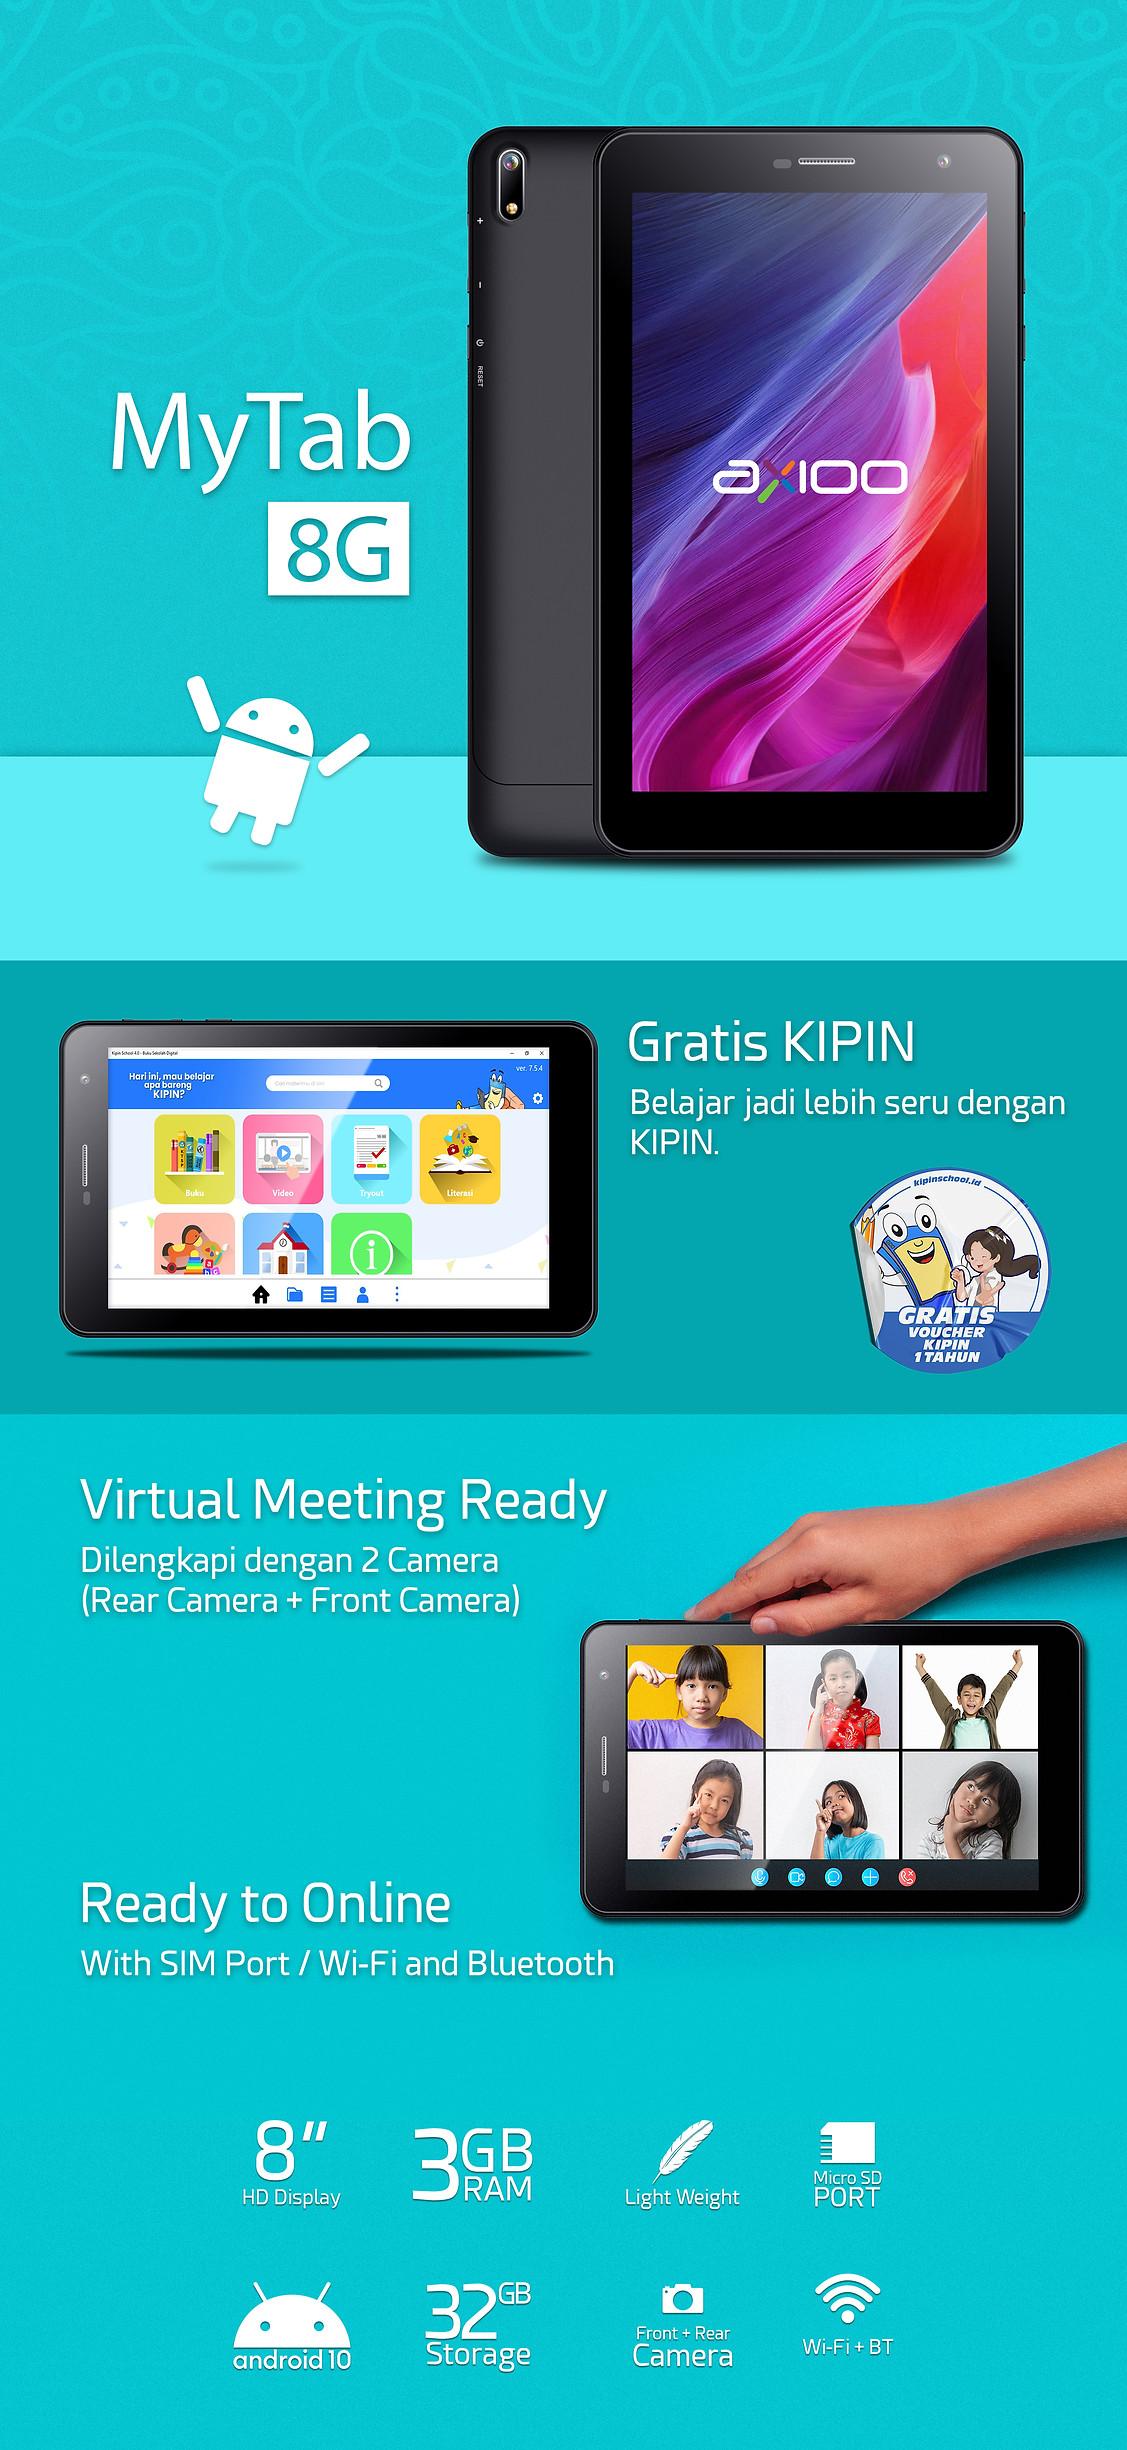 product-mytab-8g.jpg